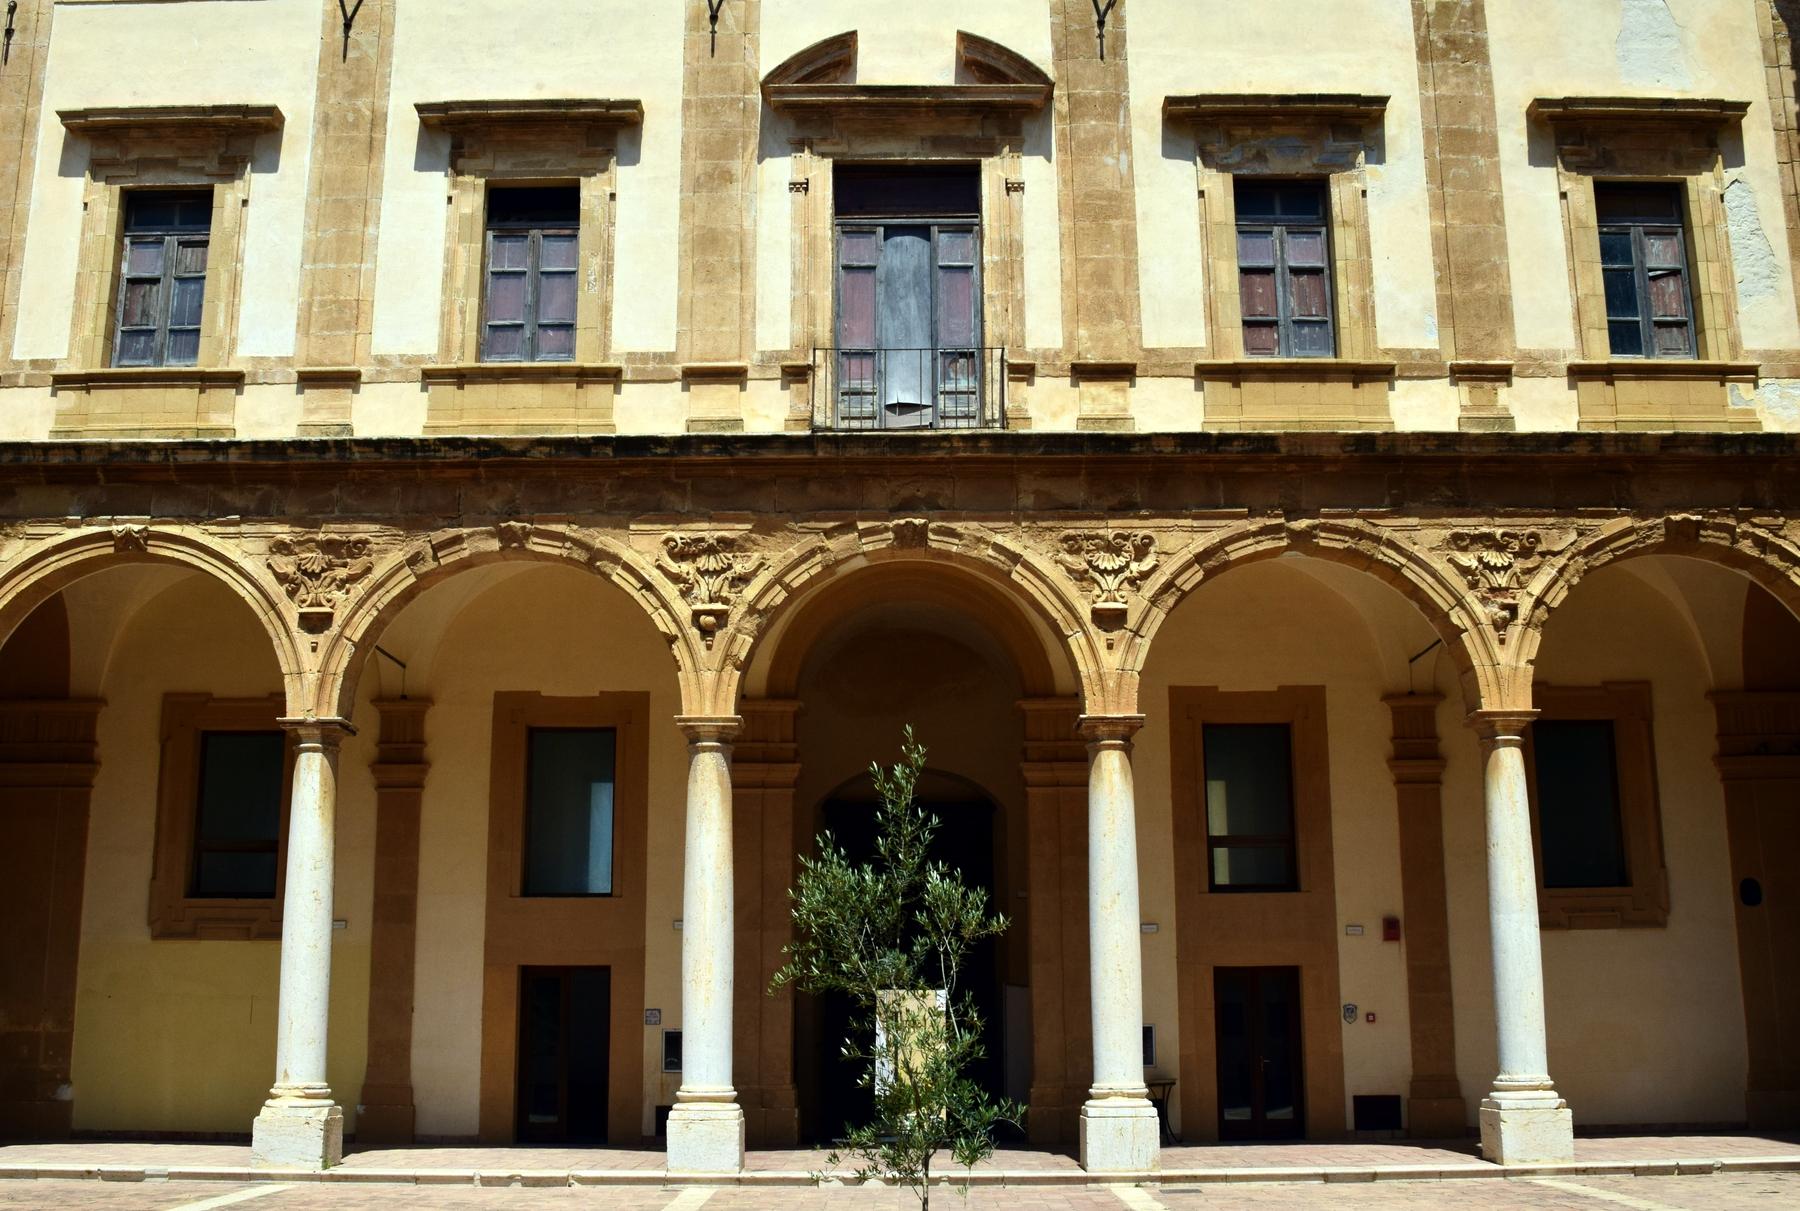 A snapshot of an Italian building's arches in Mazara del Vallo, Sicily